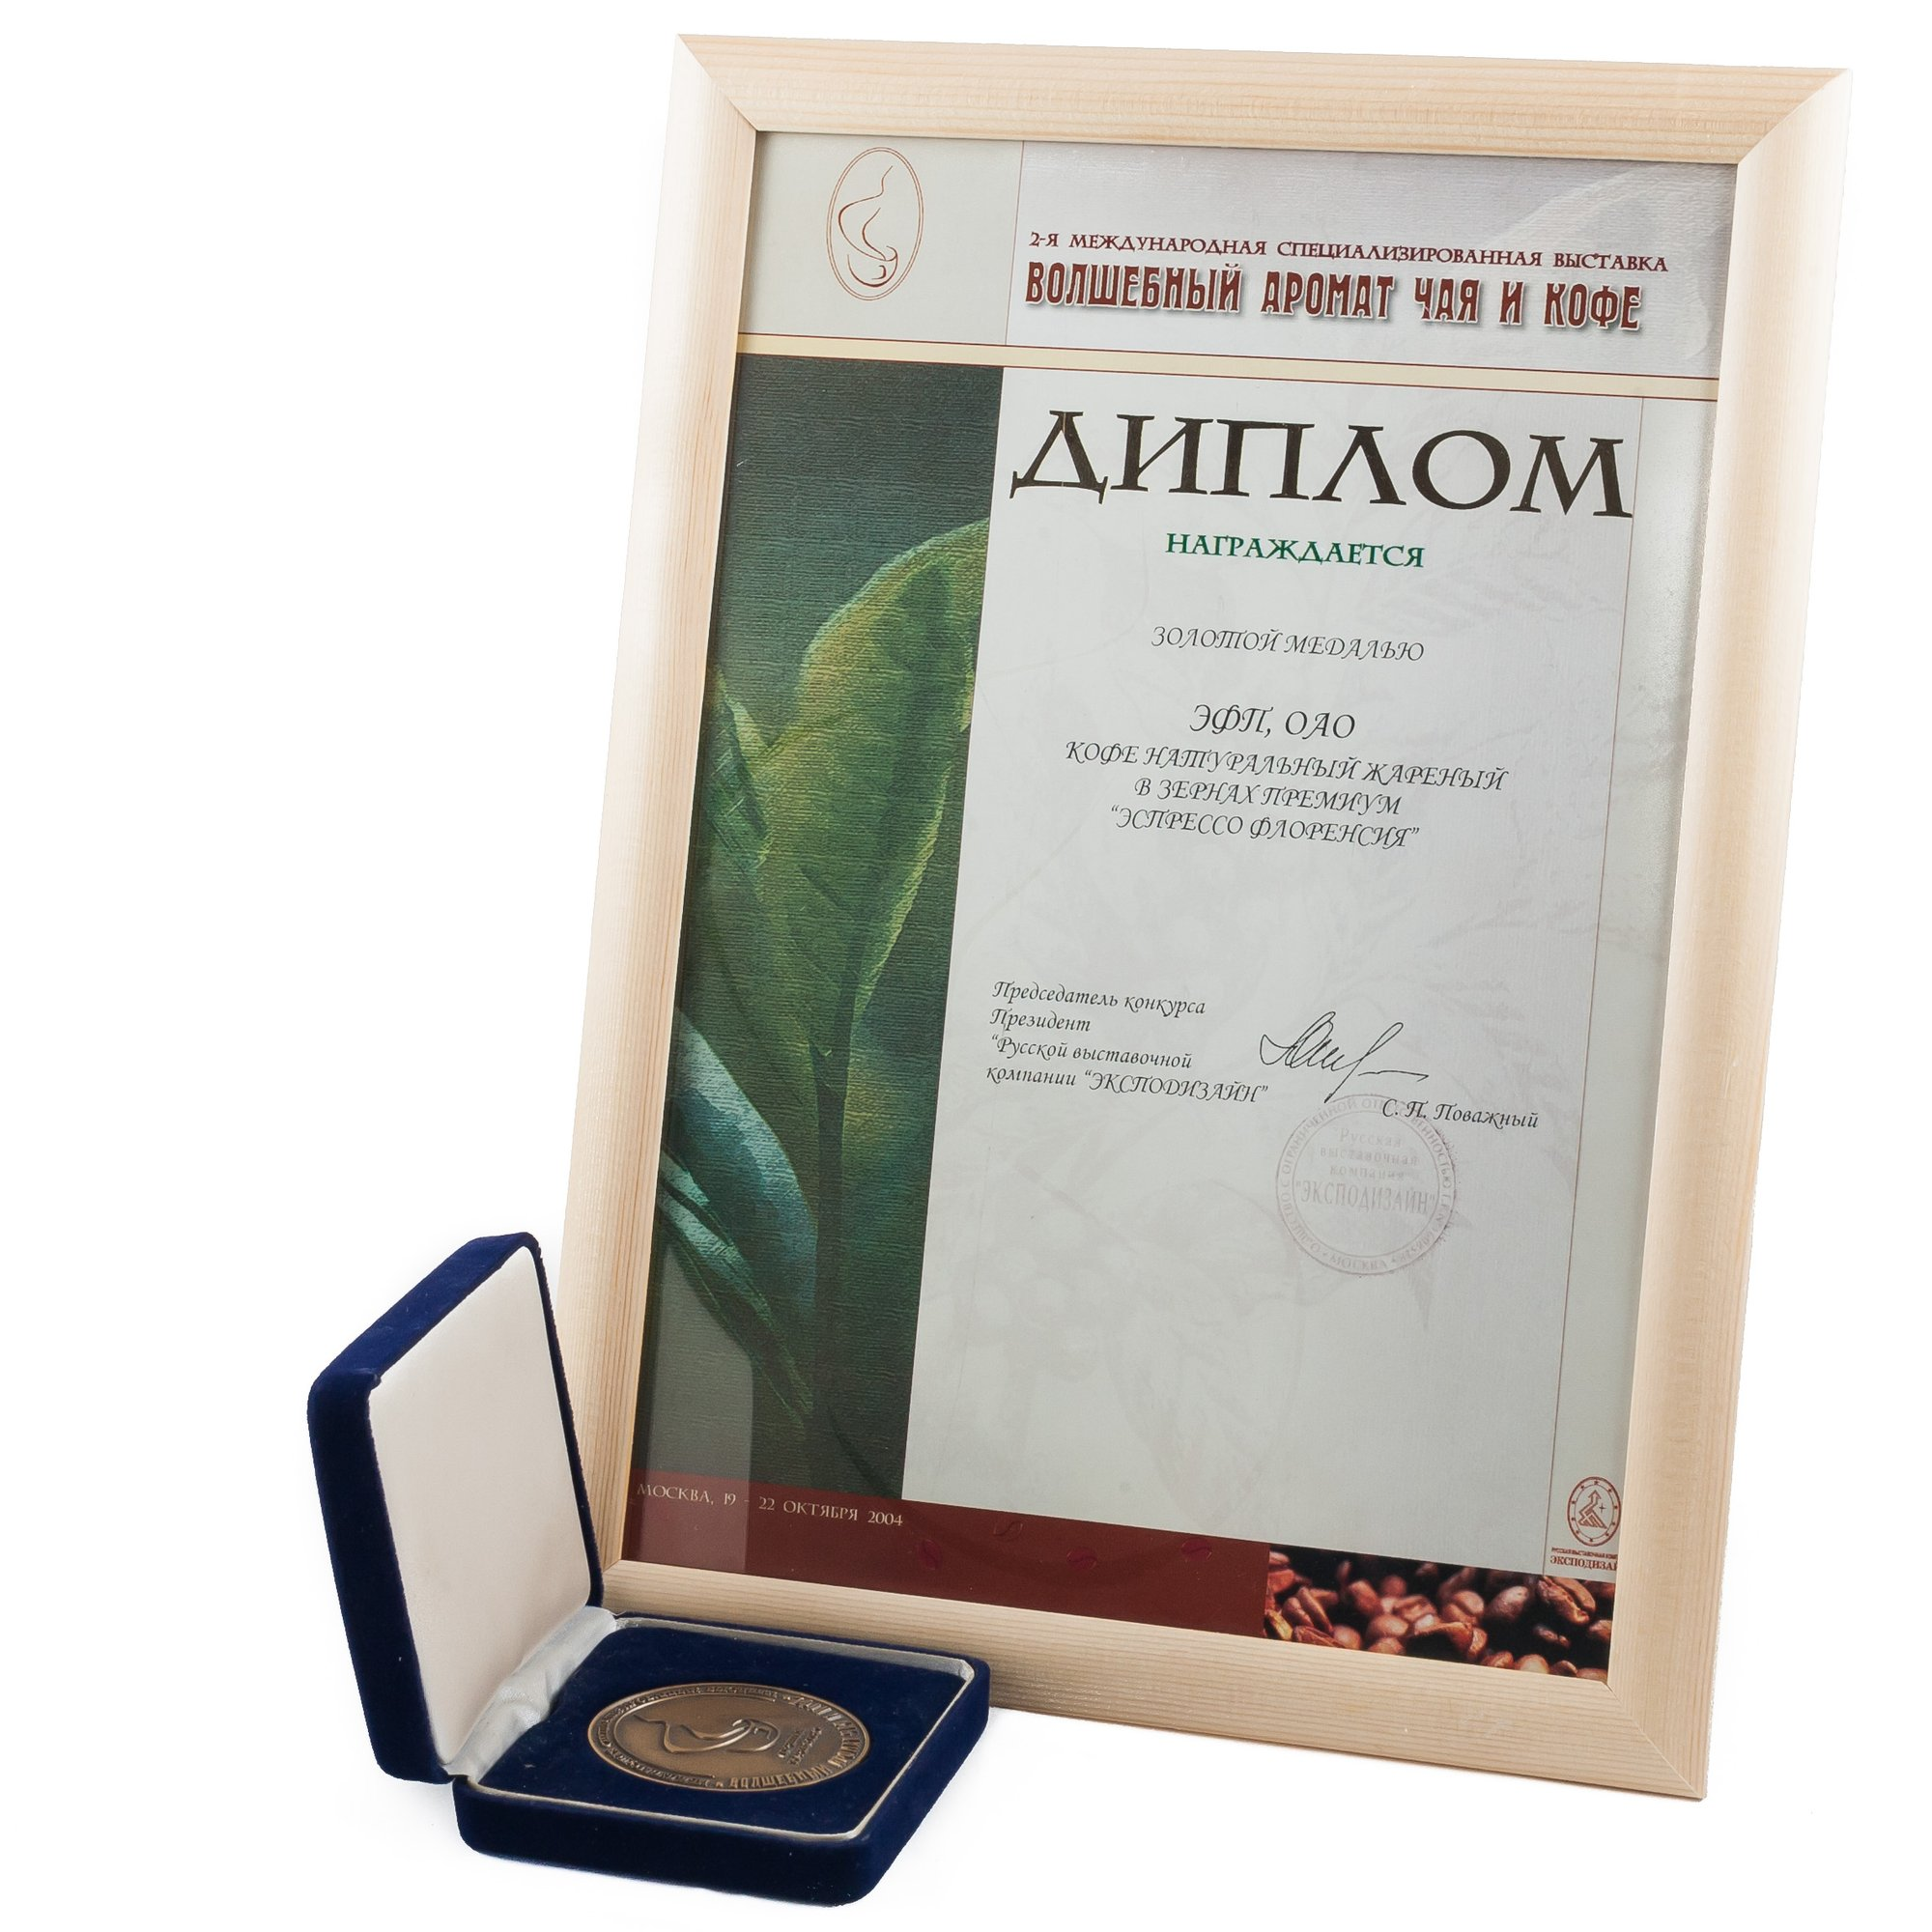 2004-volshebniy-aromat-chaja-i-kofe-efp.jpg